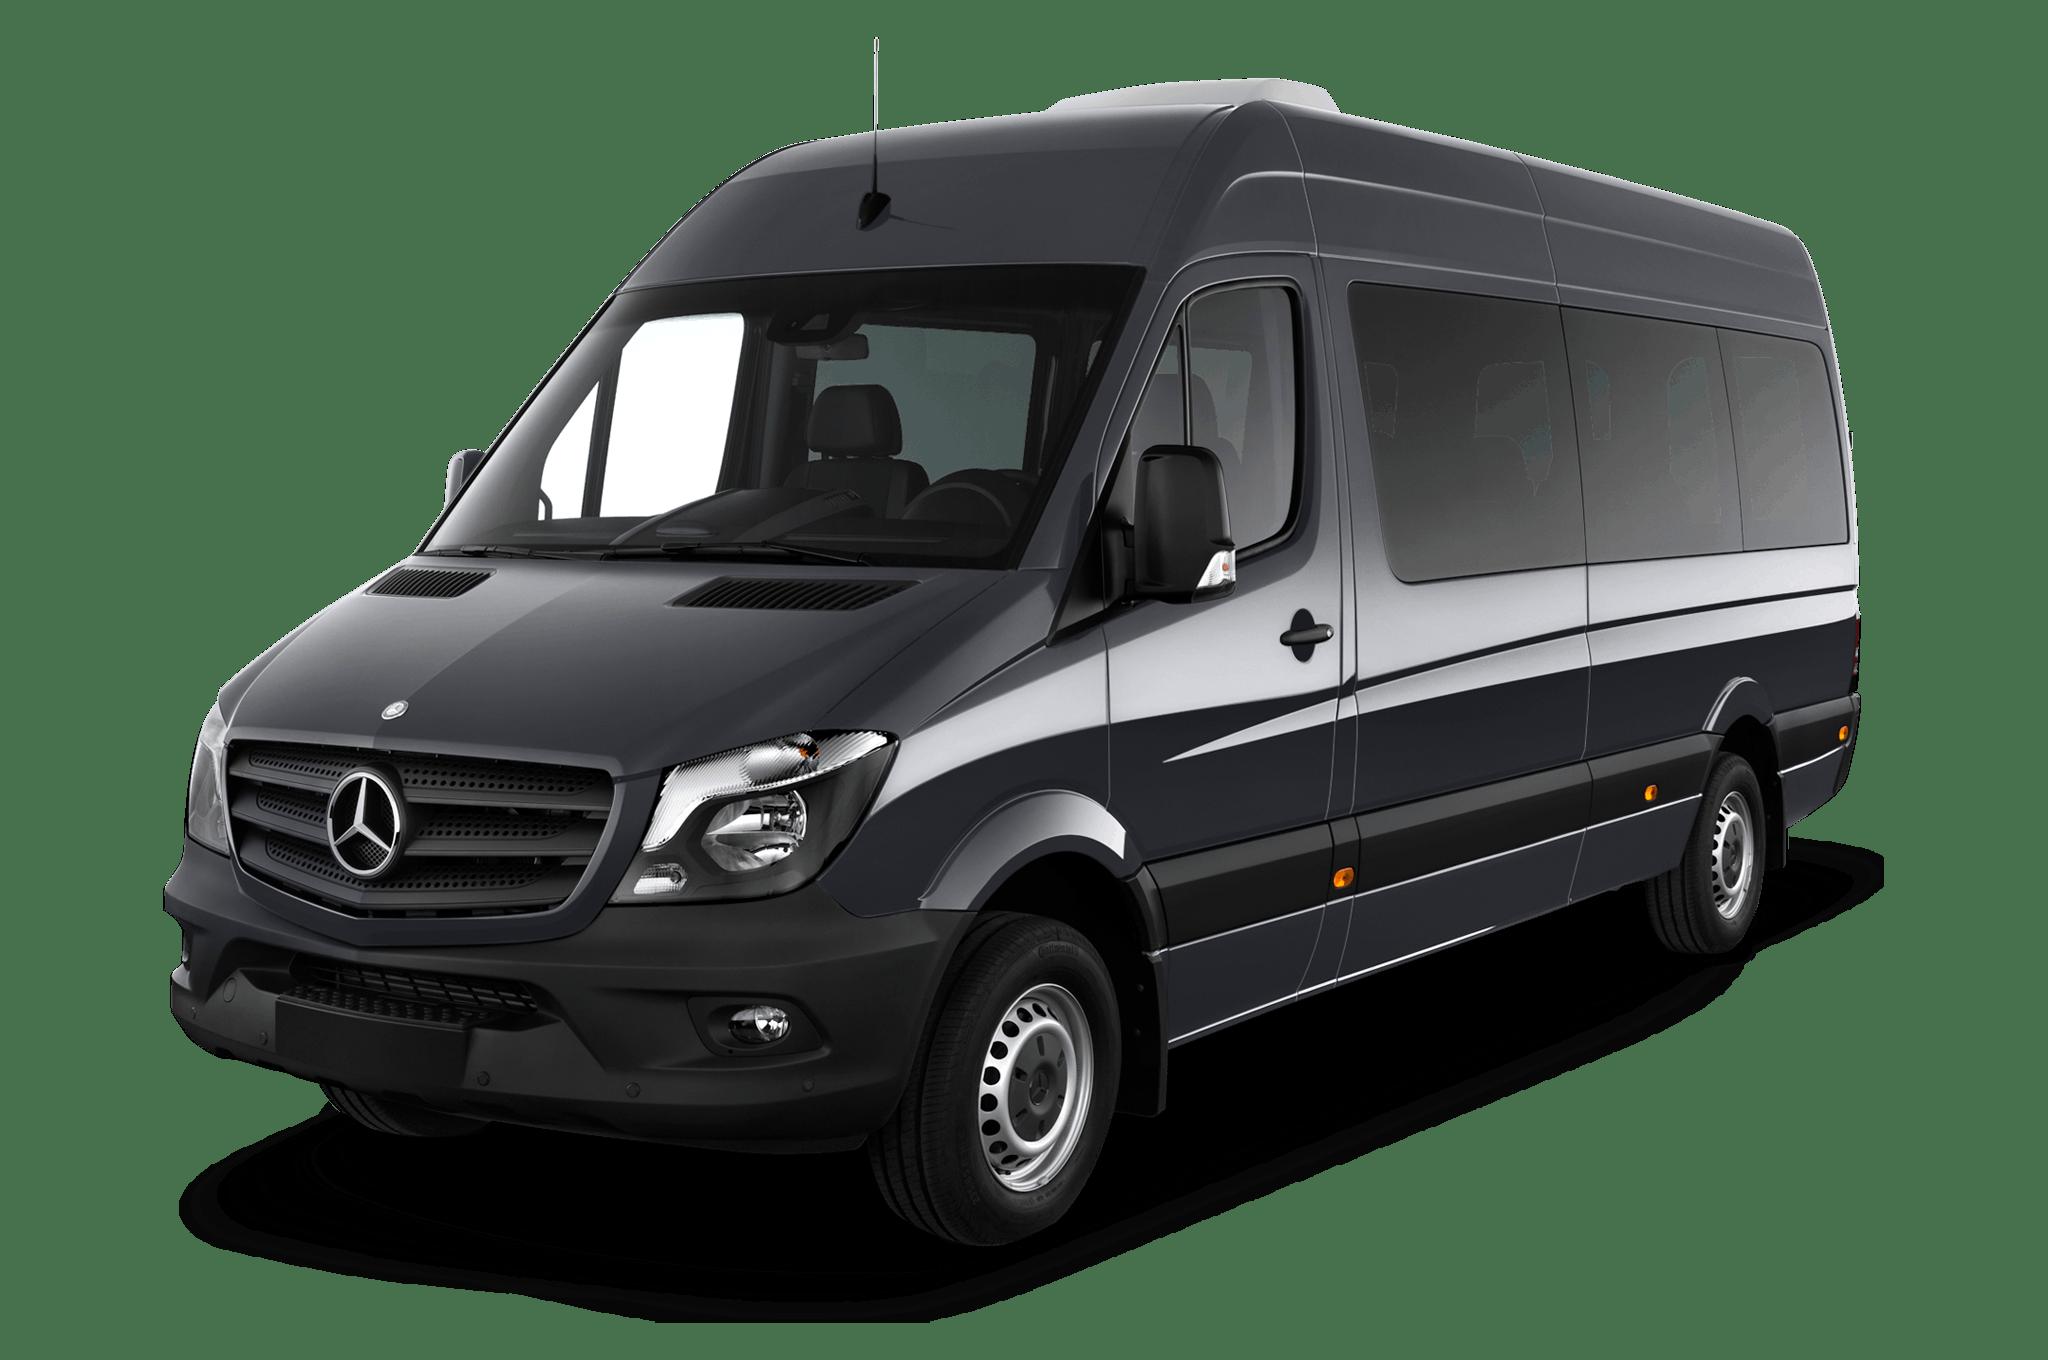 Mercedes Sprinter Vehicle Pic